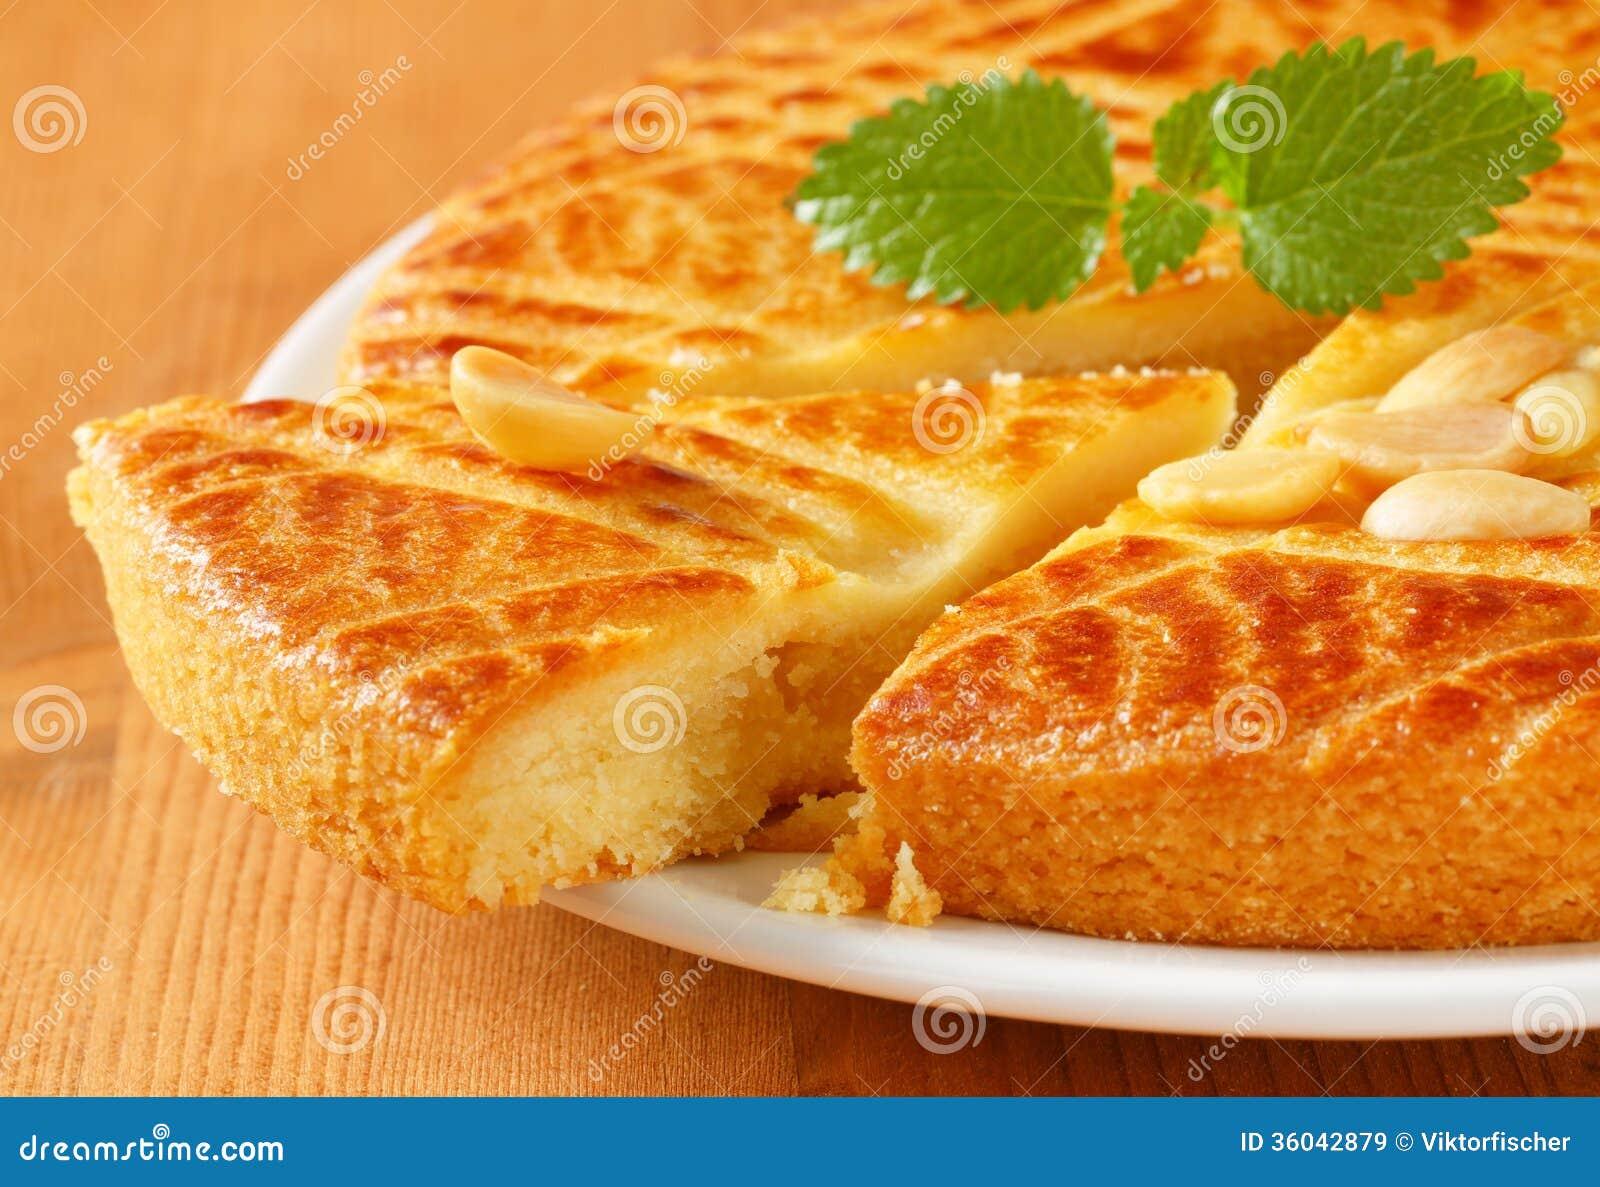 Butter Cake Recipe In Sinhala Download: Dutch Butter Cake (Boterkoek) Stock Image